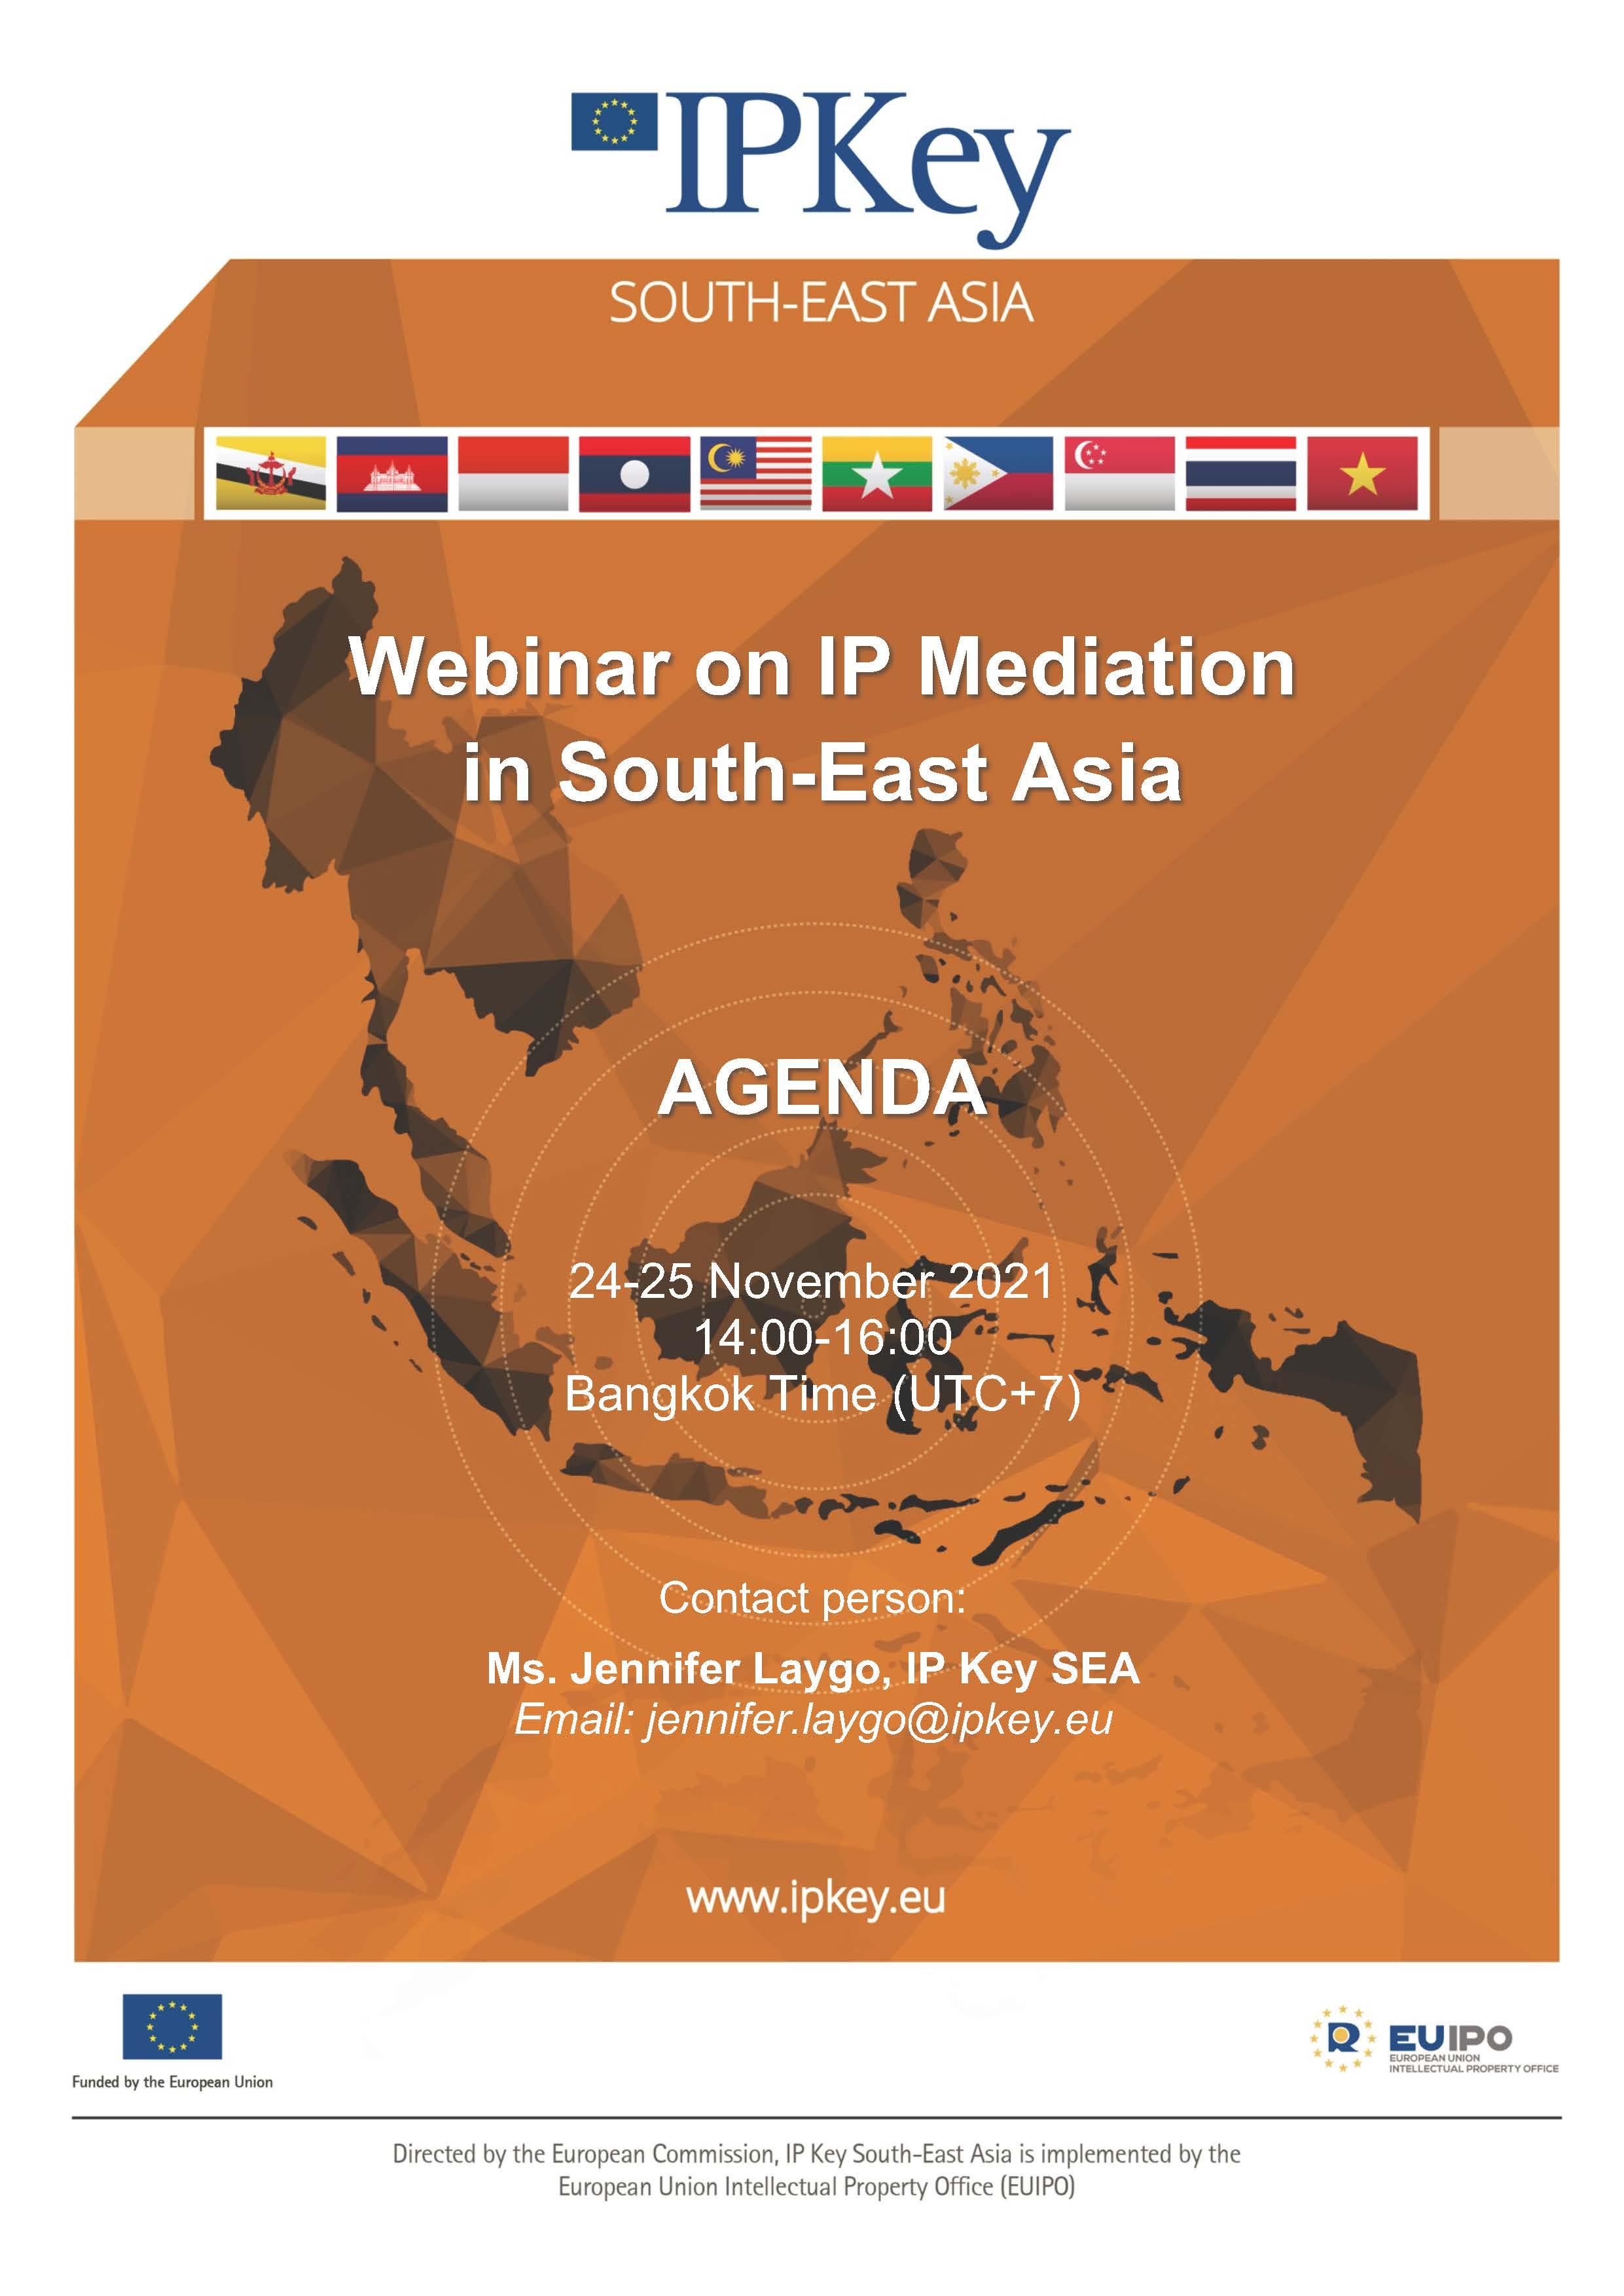 Webinar on IP Mediation in South-East Asia_ 24-25 Nov 2021